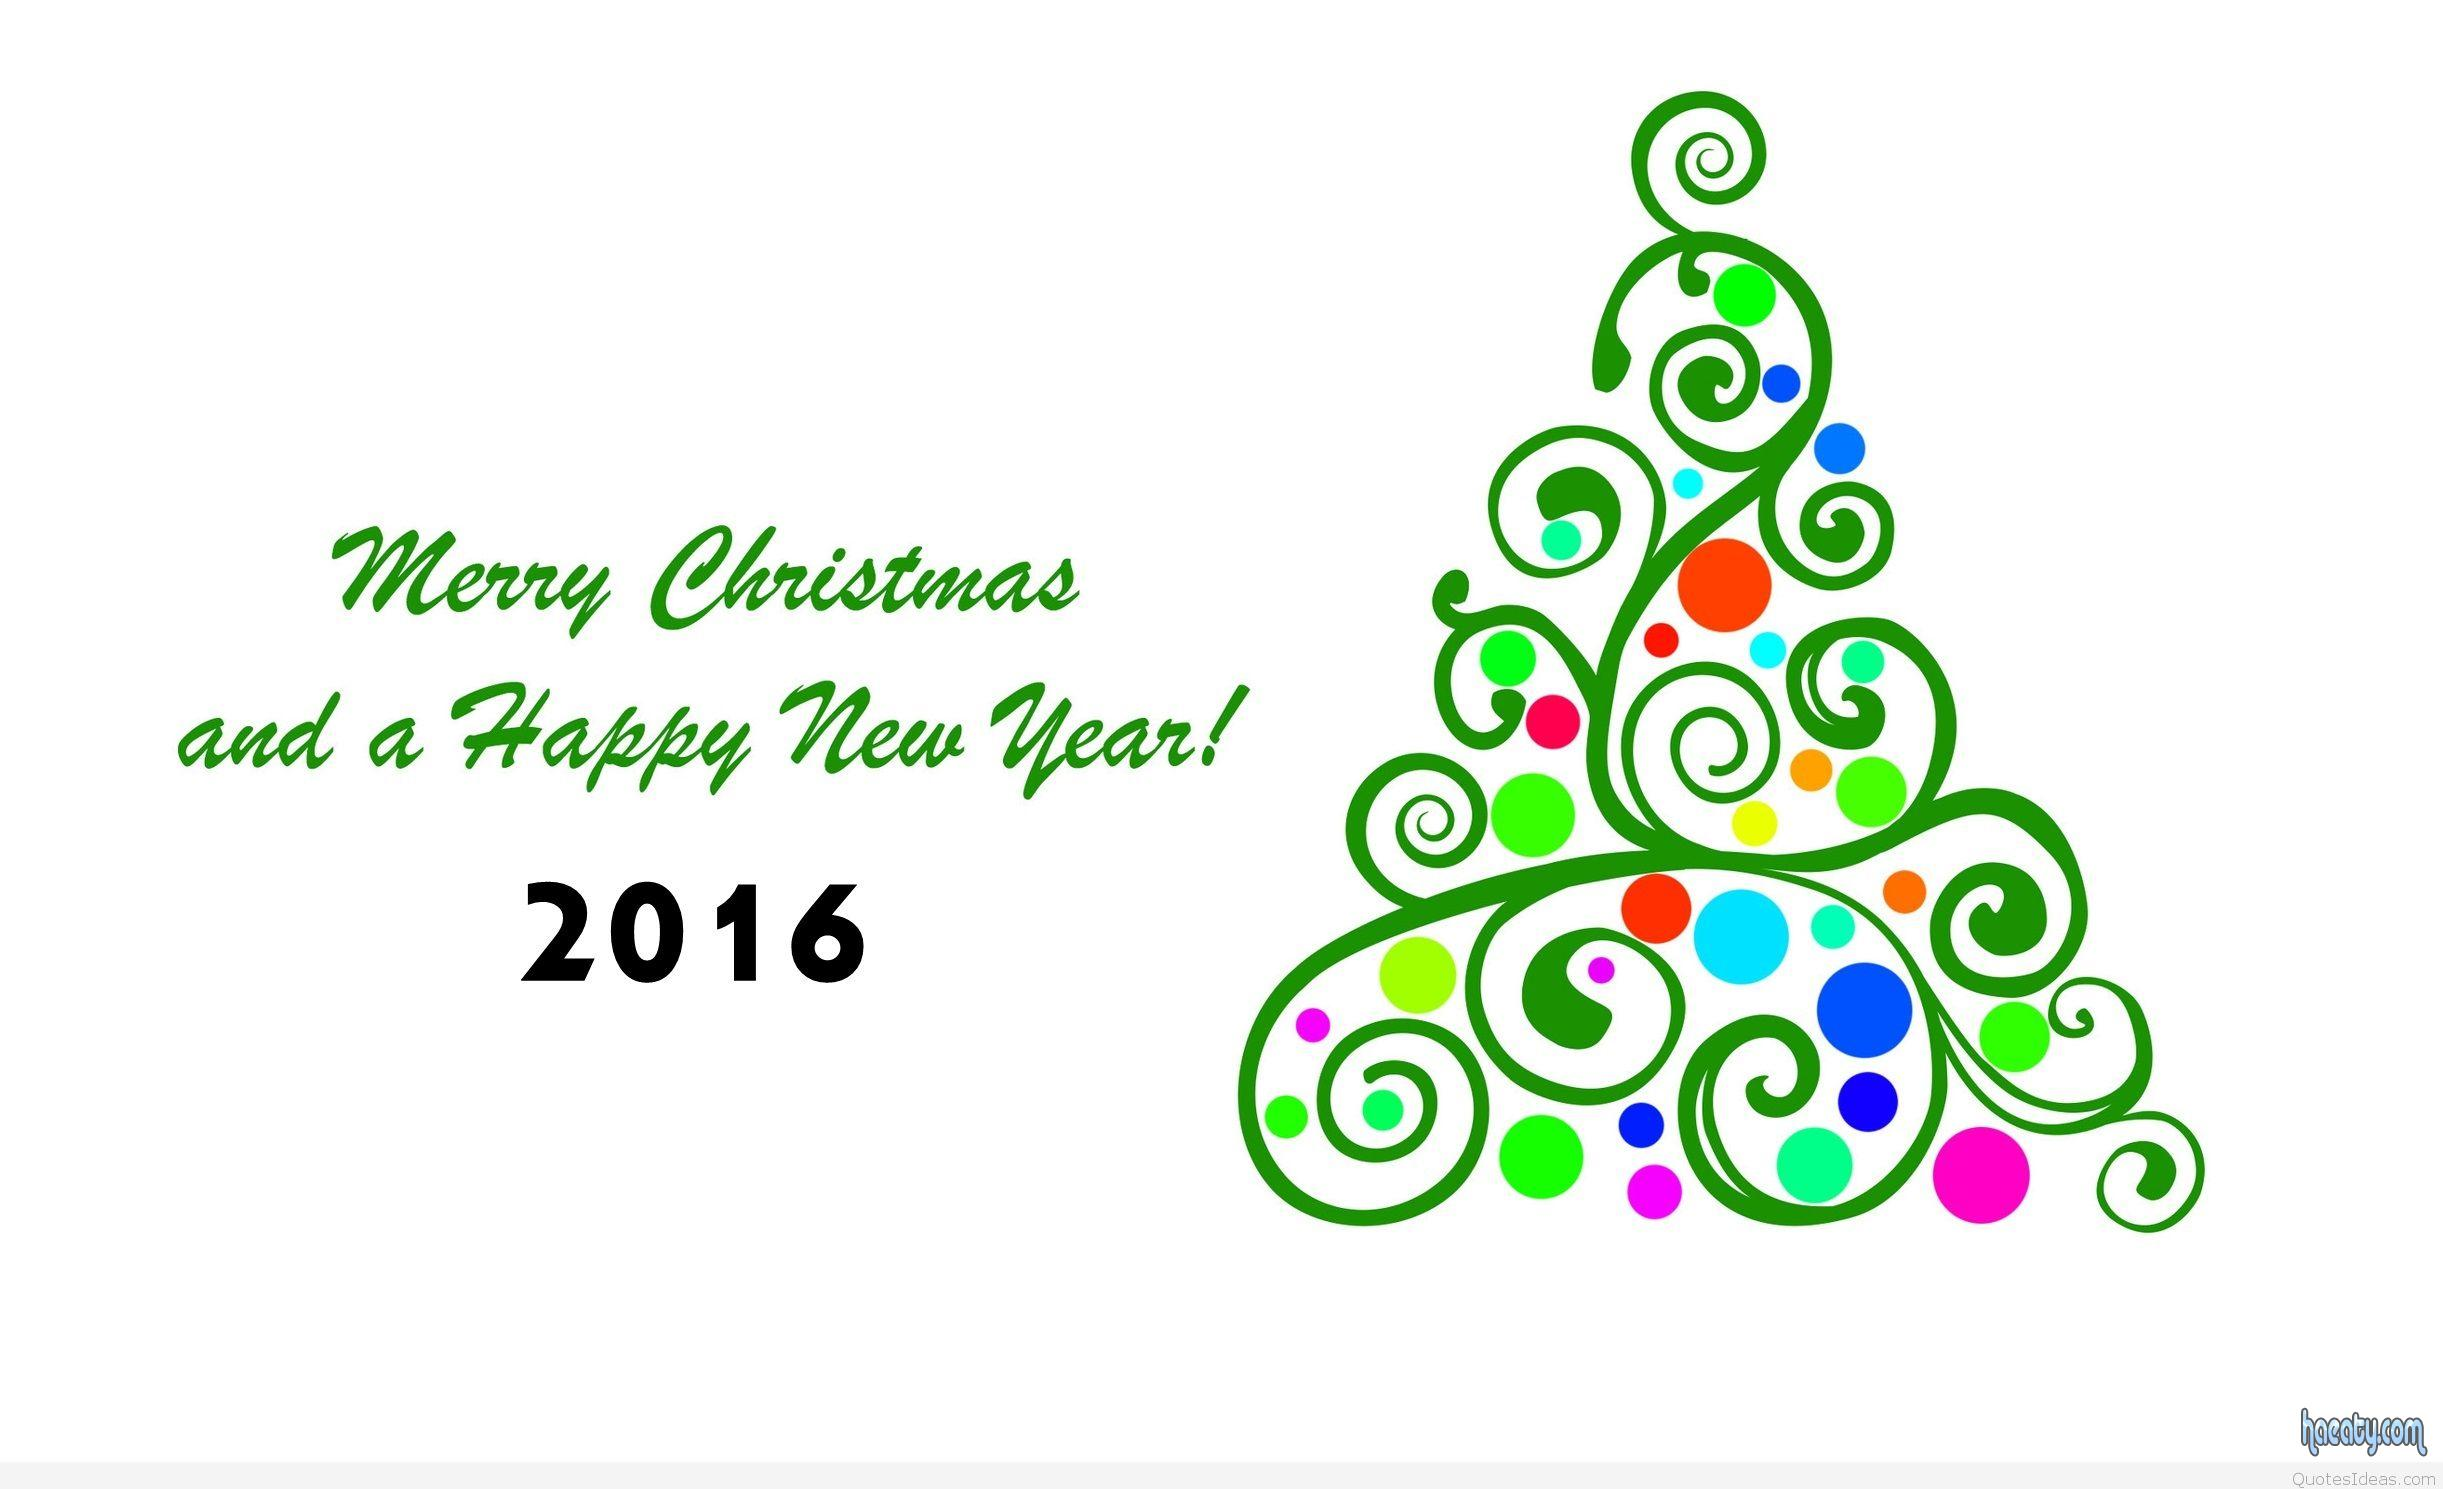 خلفيات عيد الكريسماس 2016-Merry-Christmas-and-Happy-new-year-2016